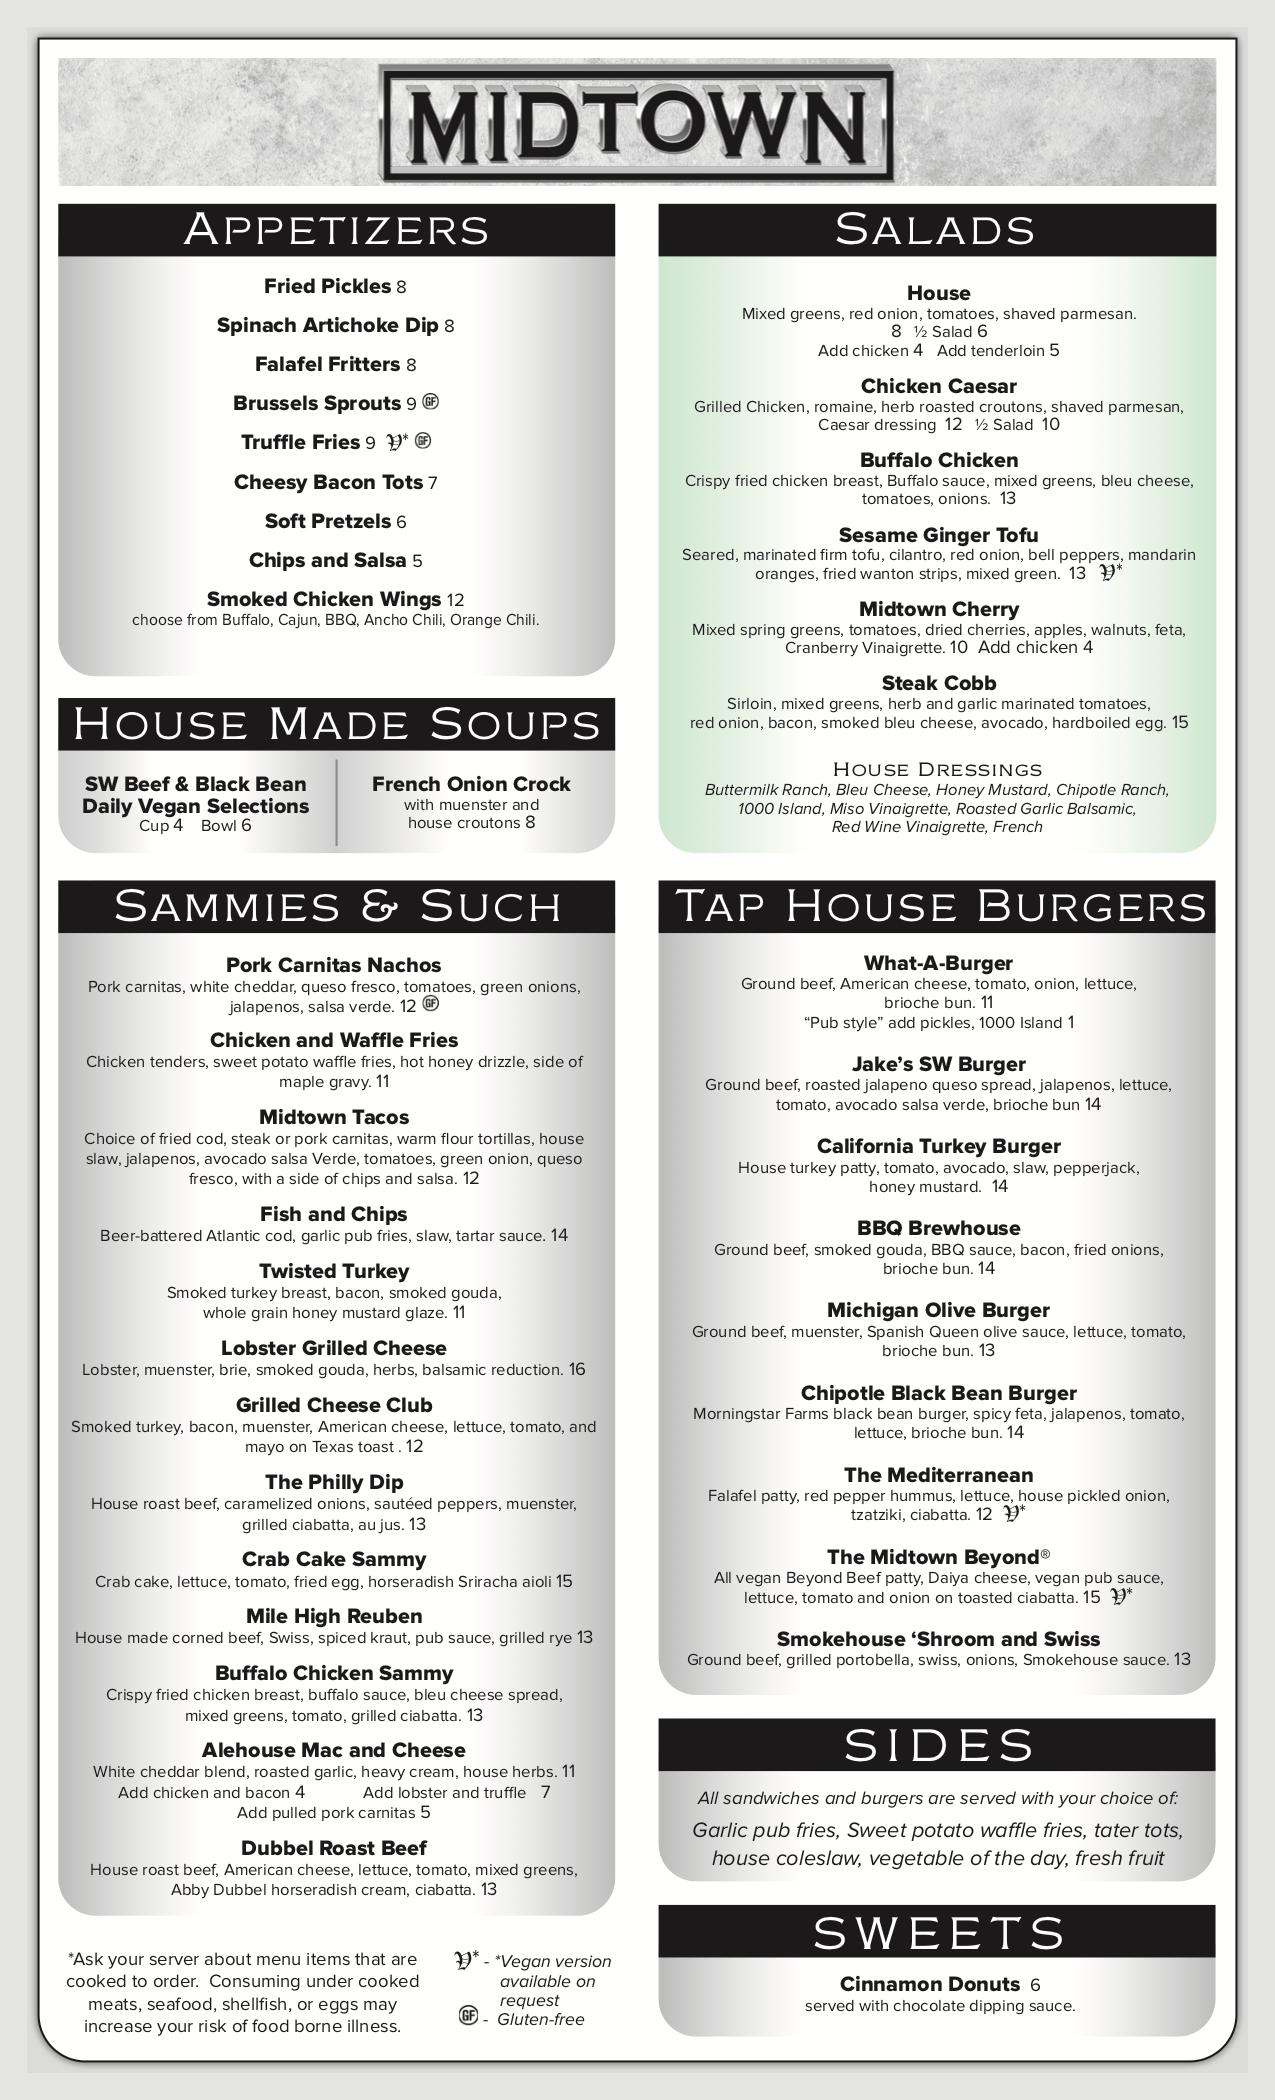 Midtown_menu-1.png